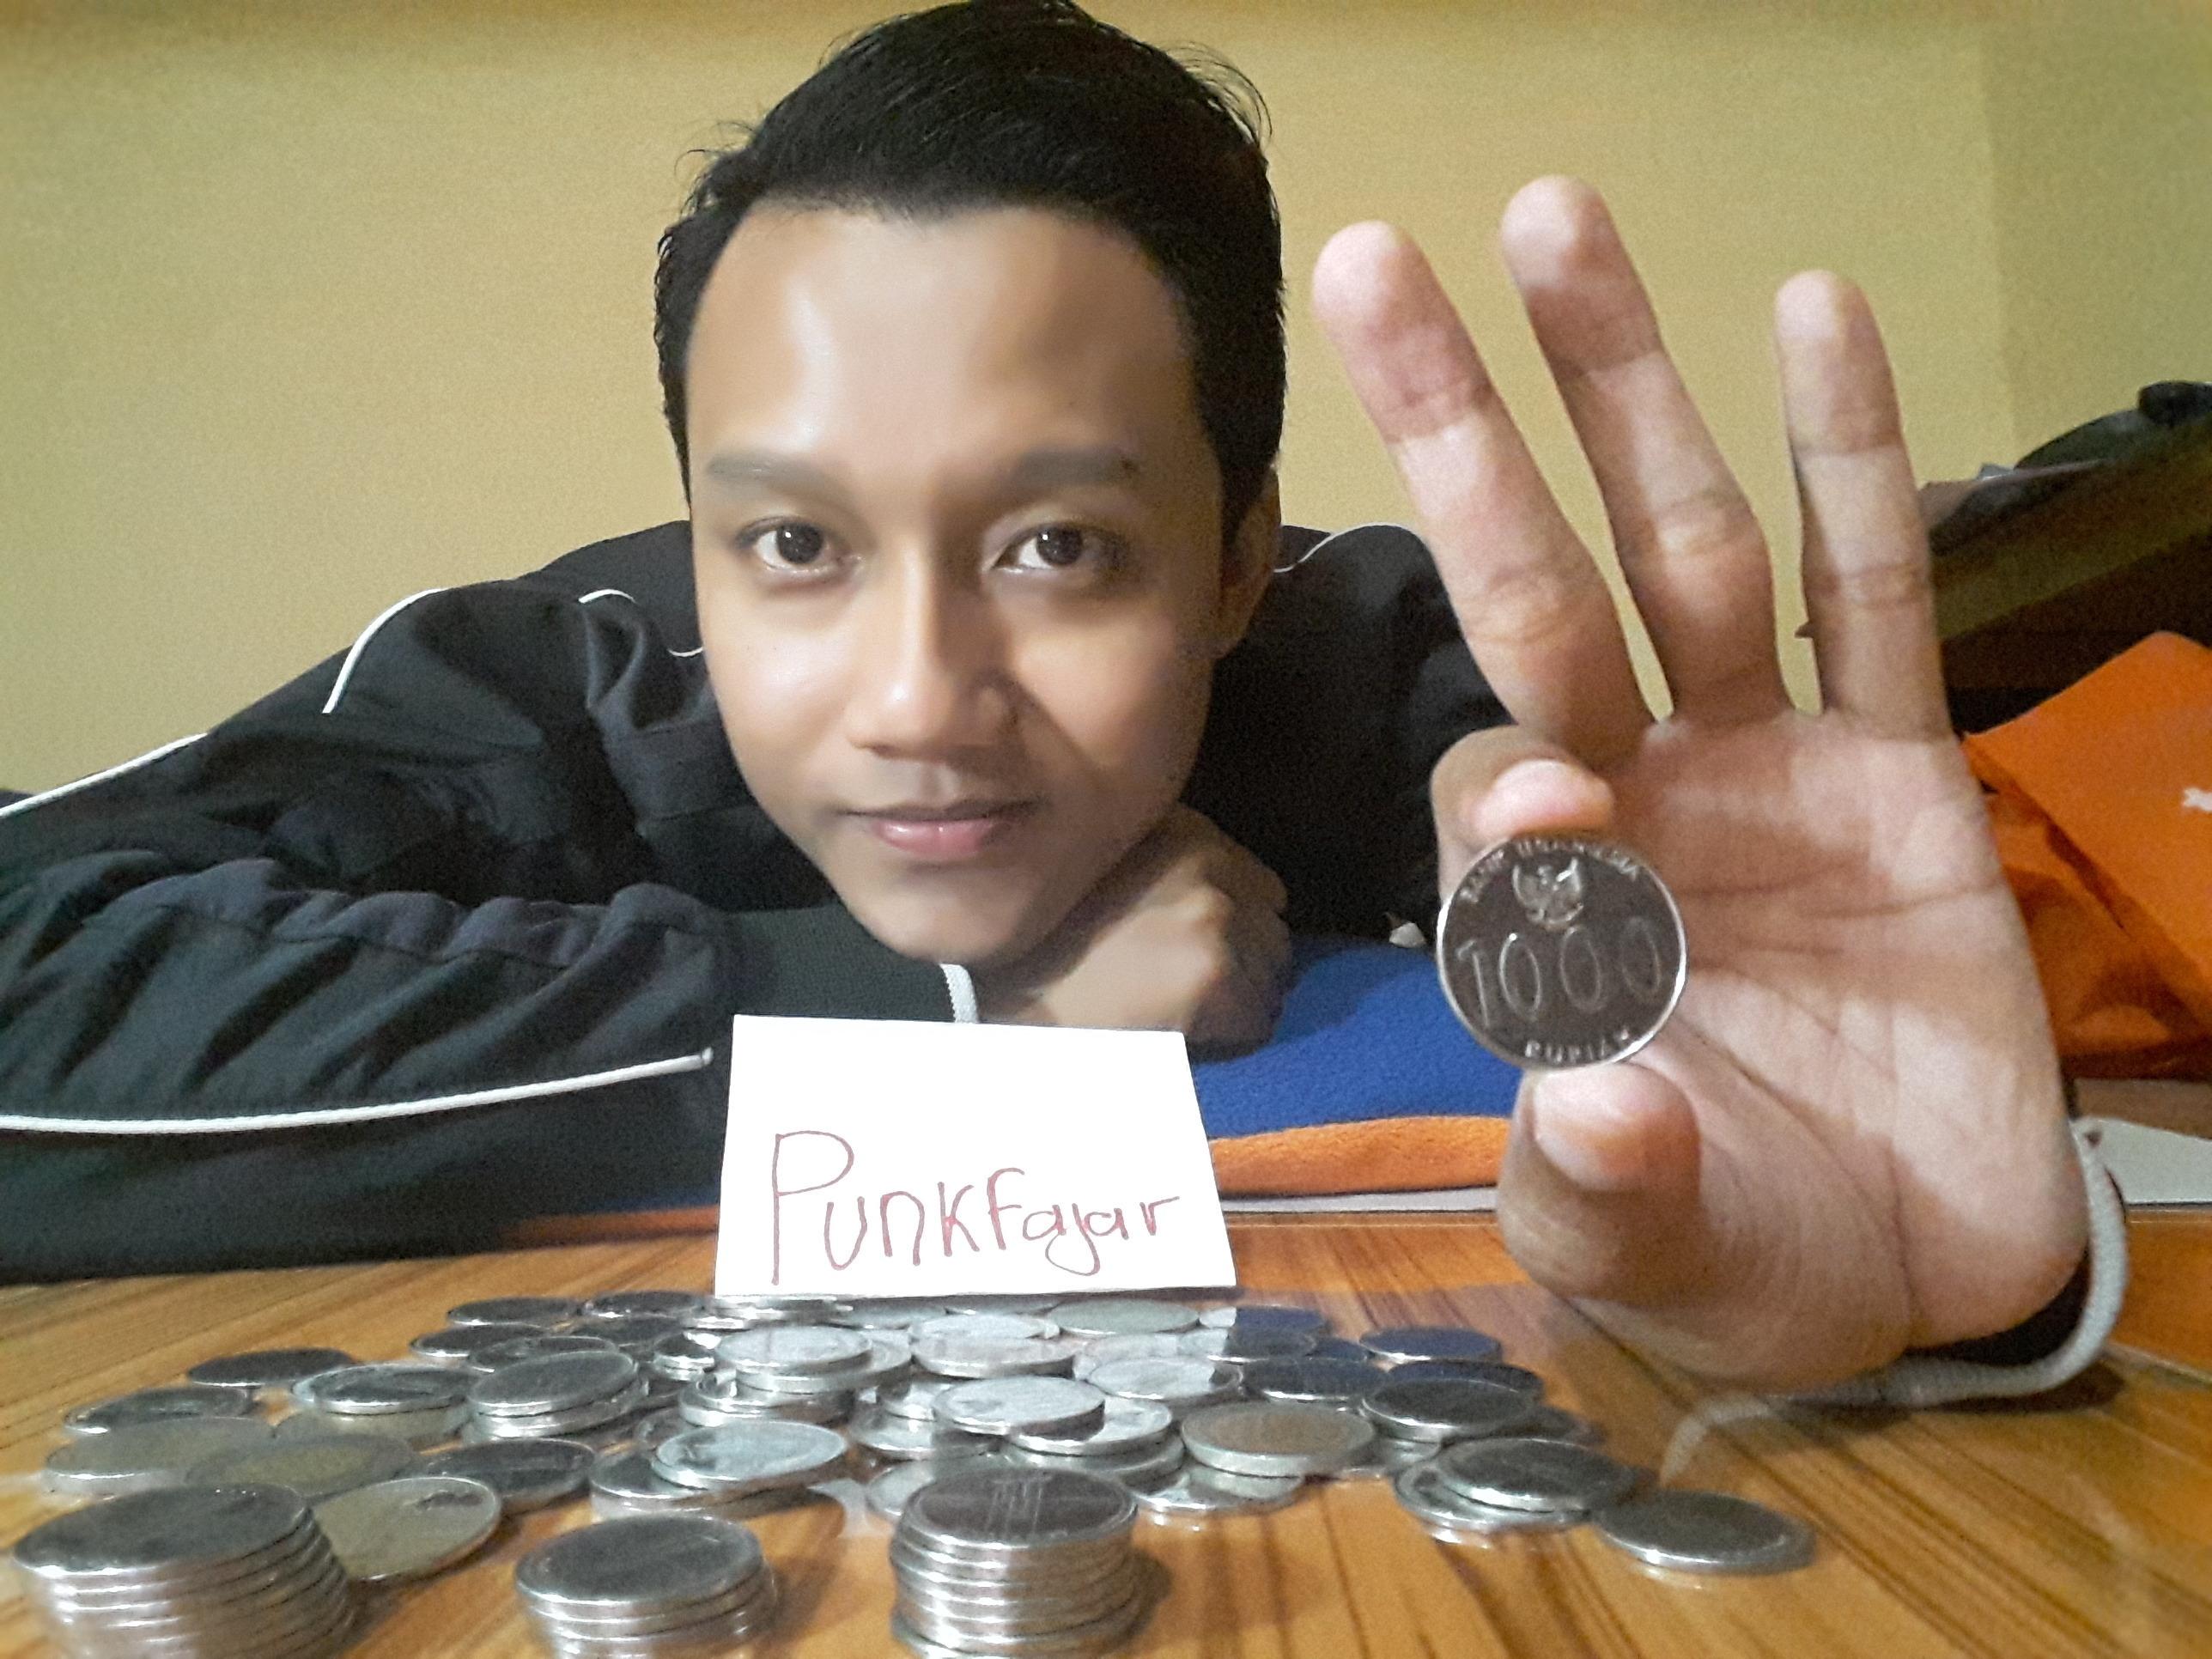 #BestCollection koleksi uang koin Rp 1000an ane gan, ngumpulin dari uang kembalian :D